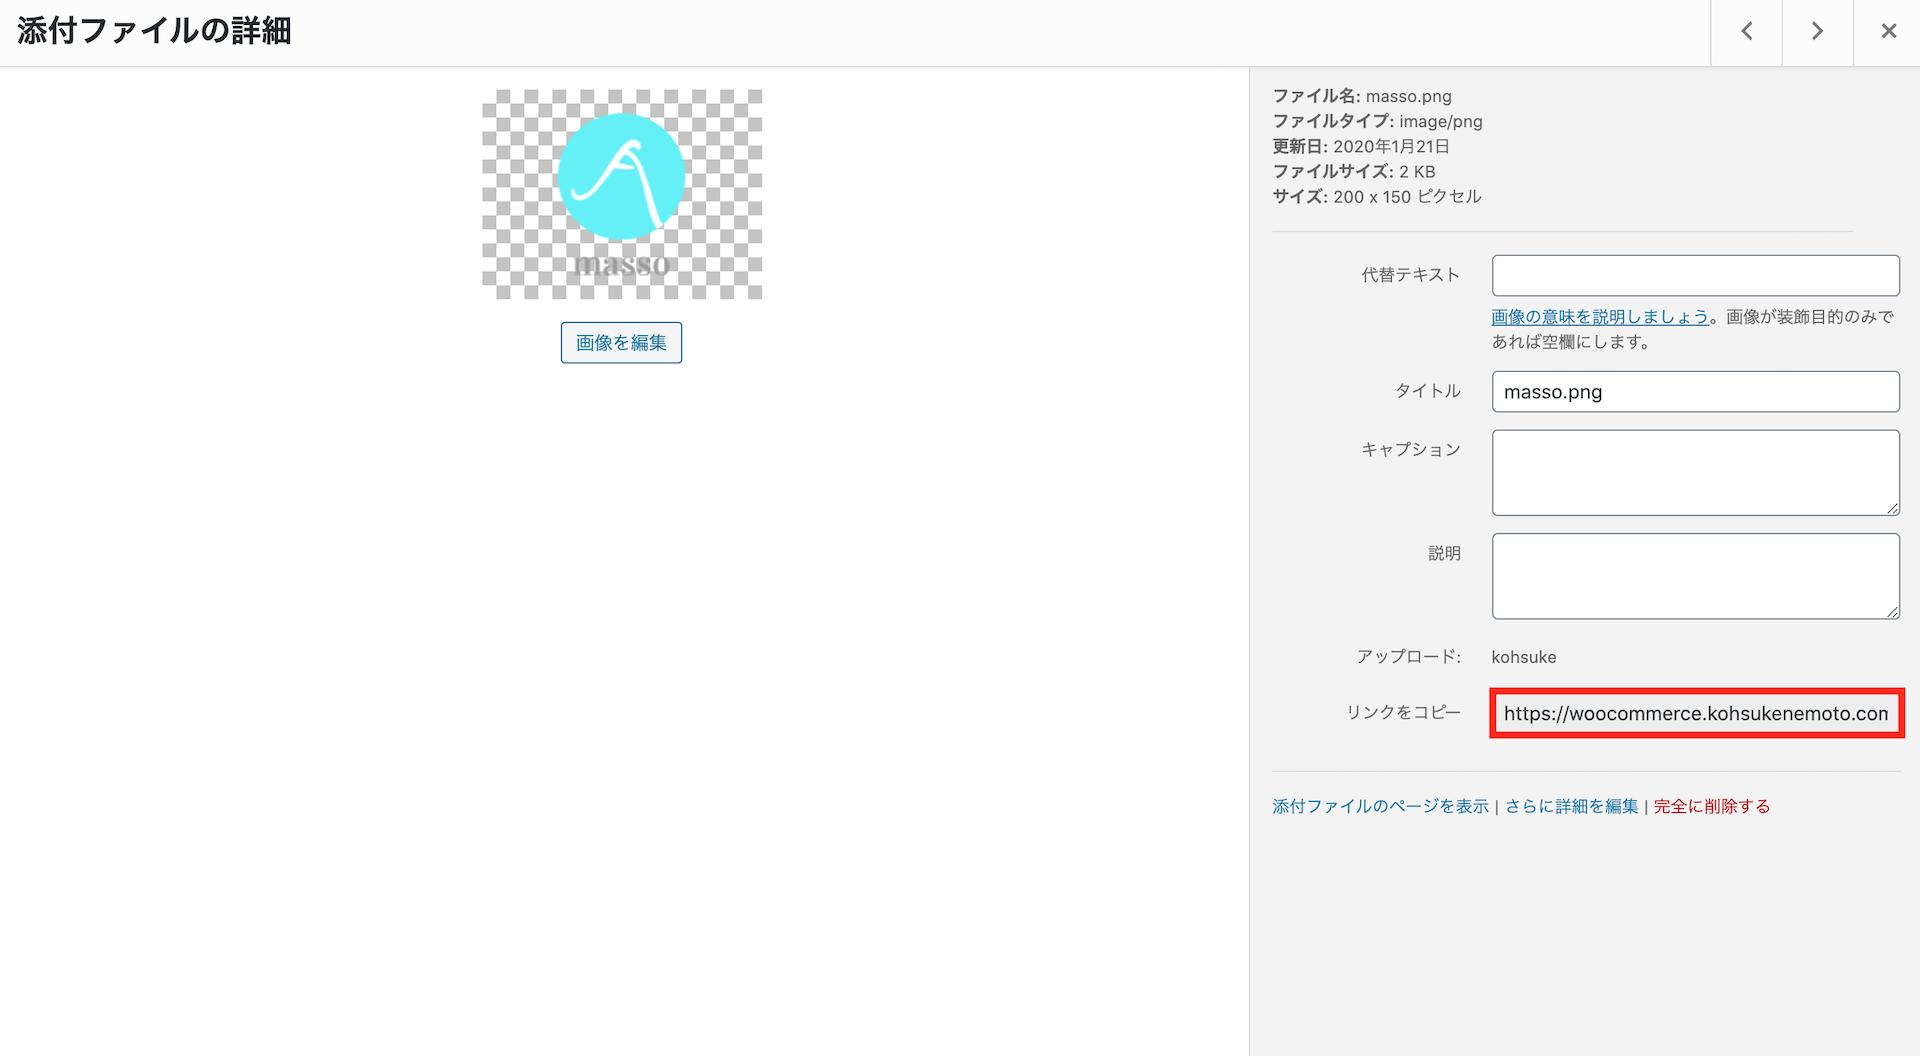 WooCommerceのメールテンプレートでヘッダー画像を挿入する